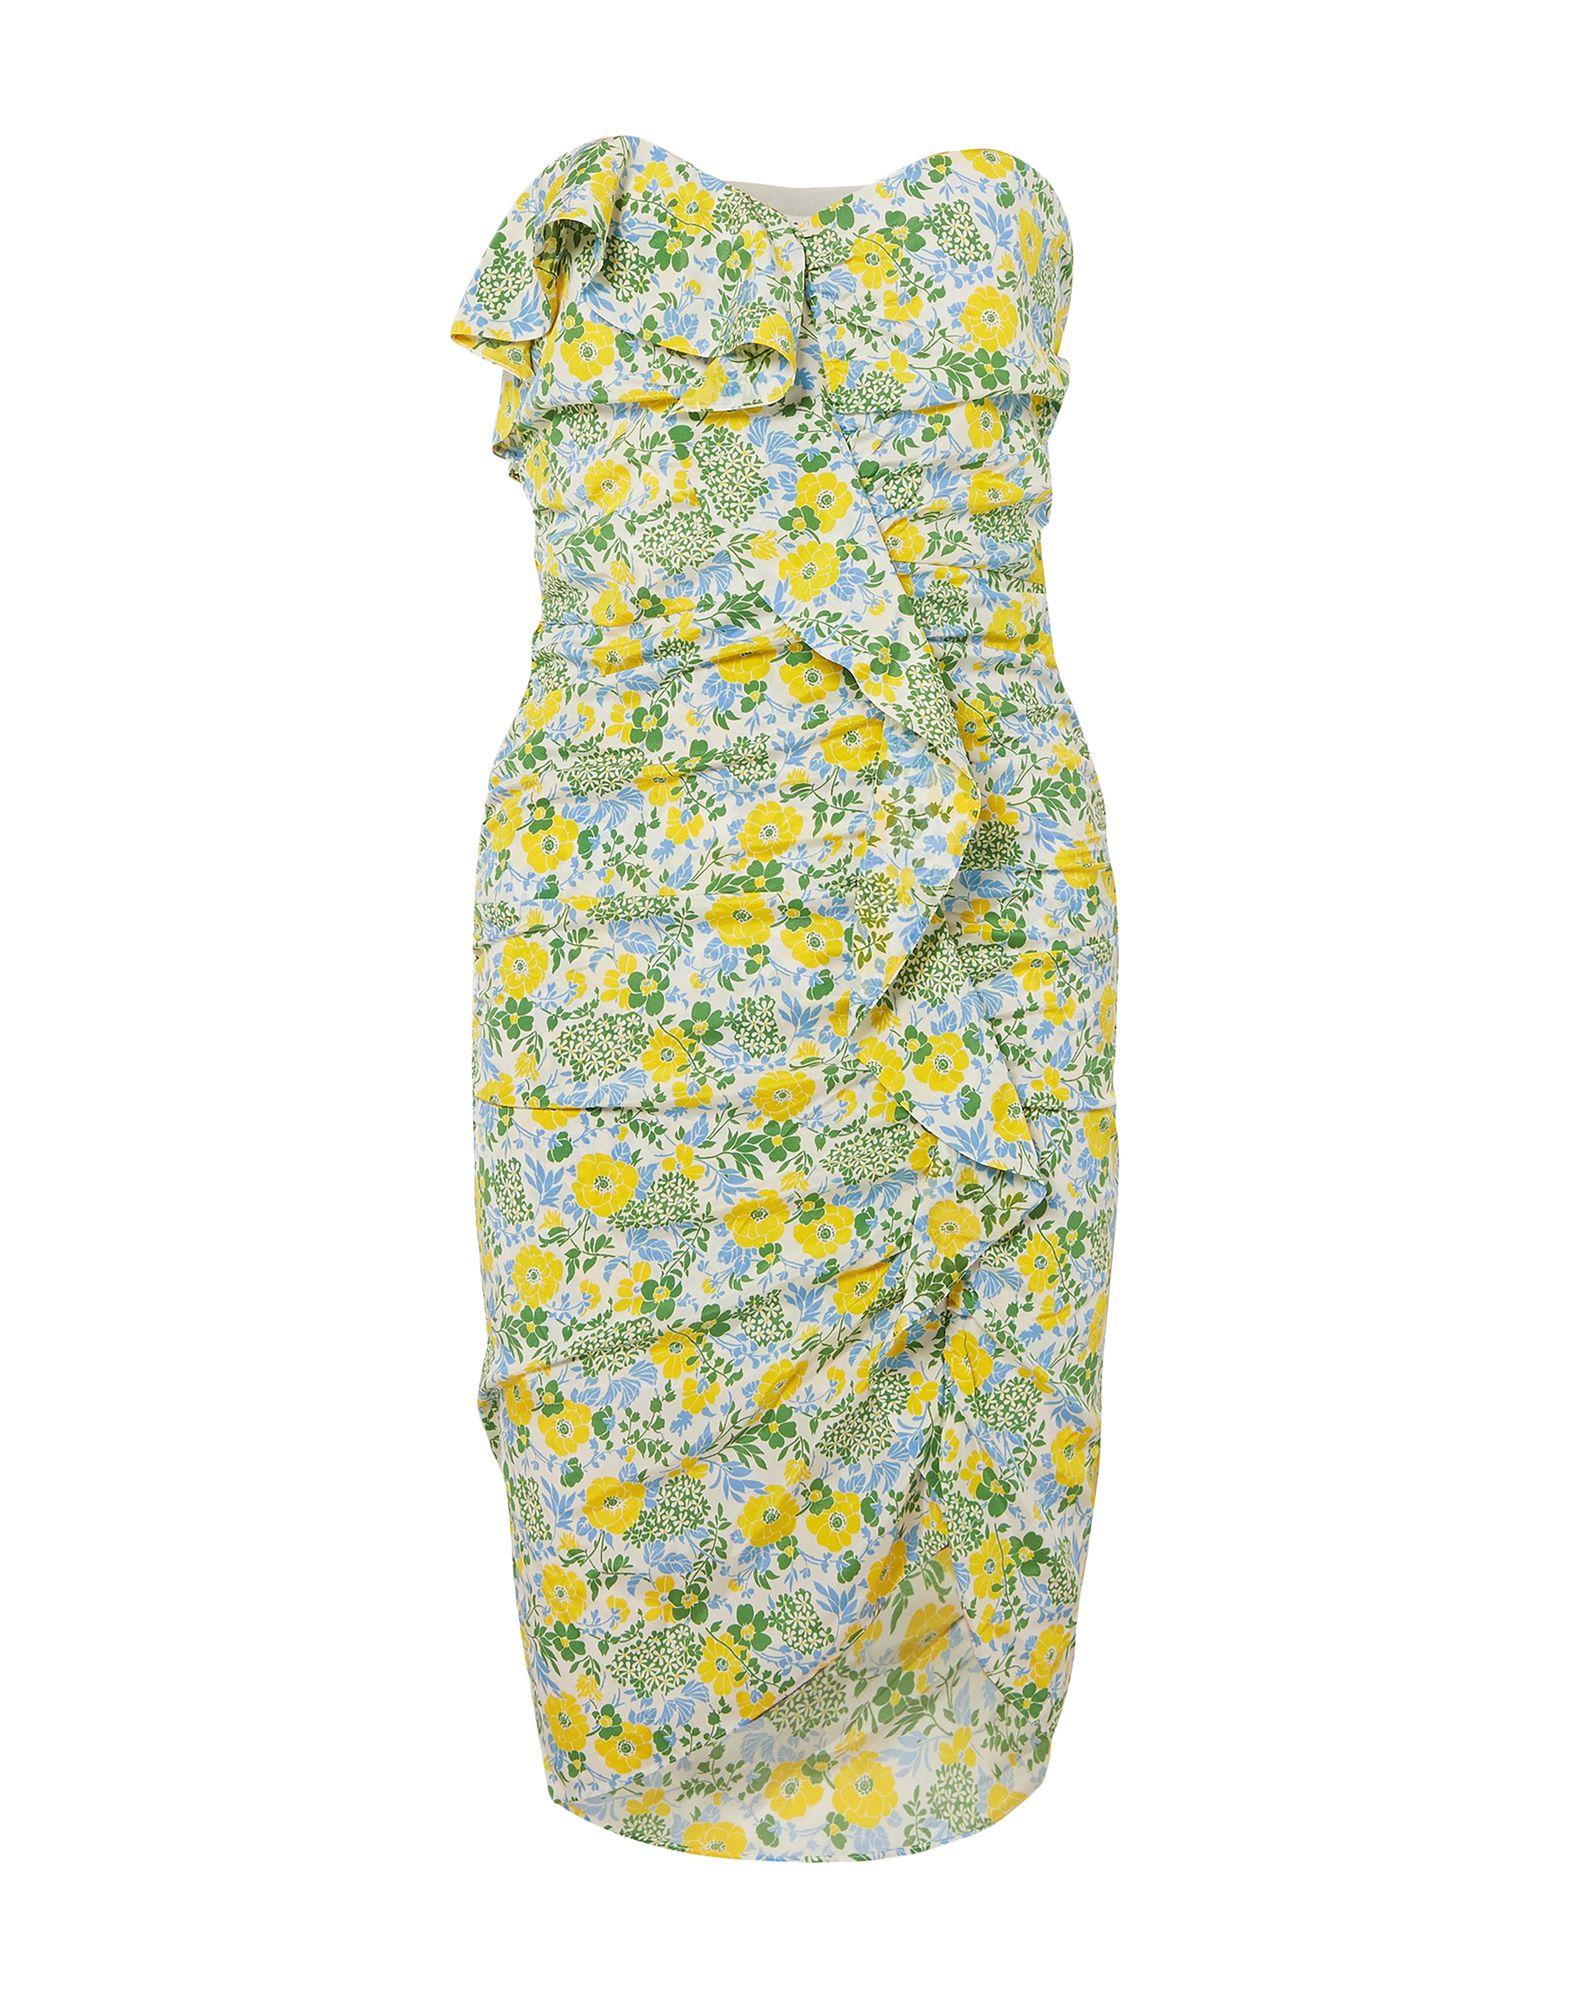 VERONICA BEARD Knee-length dresses. plain weave, frills, ruffles, floral design, deep neckline, sleeveless, no pockets, side closure, hook-and-bar, zip, inside with stays, stretch. 91% Silk, 9% Elastane